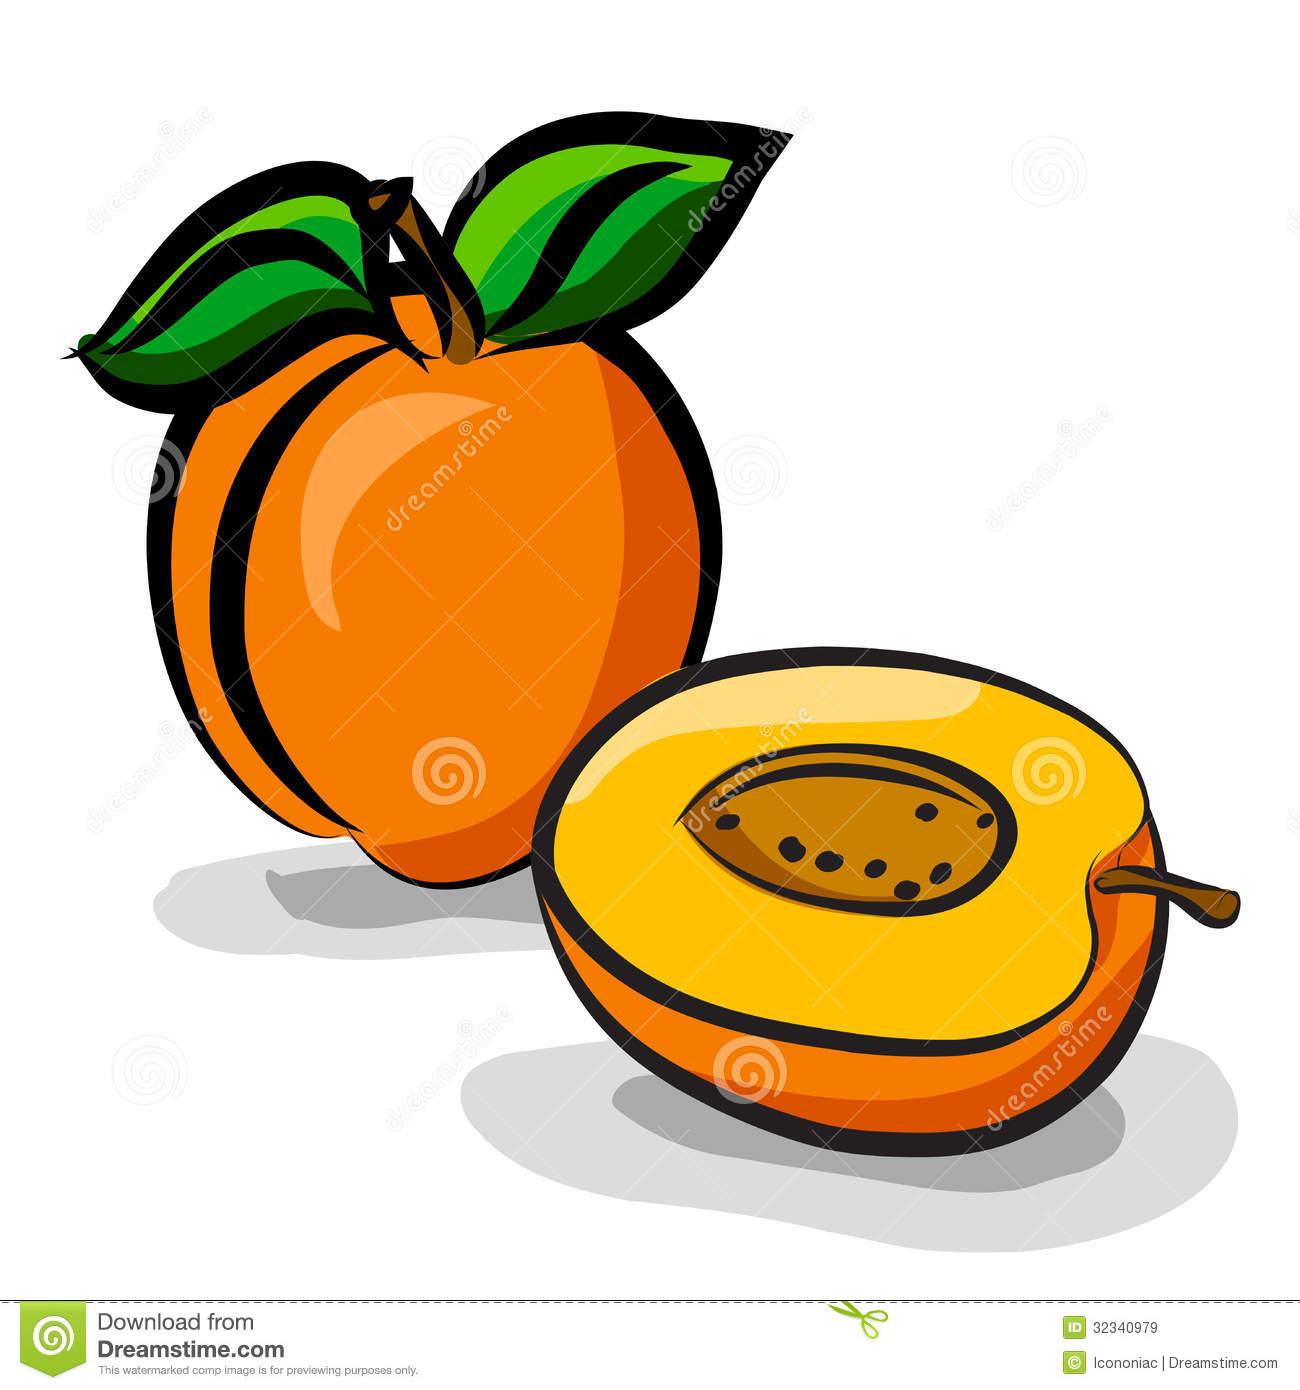 Apricot clipart Free Clipart Clipart Apricot Images